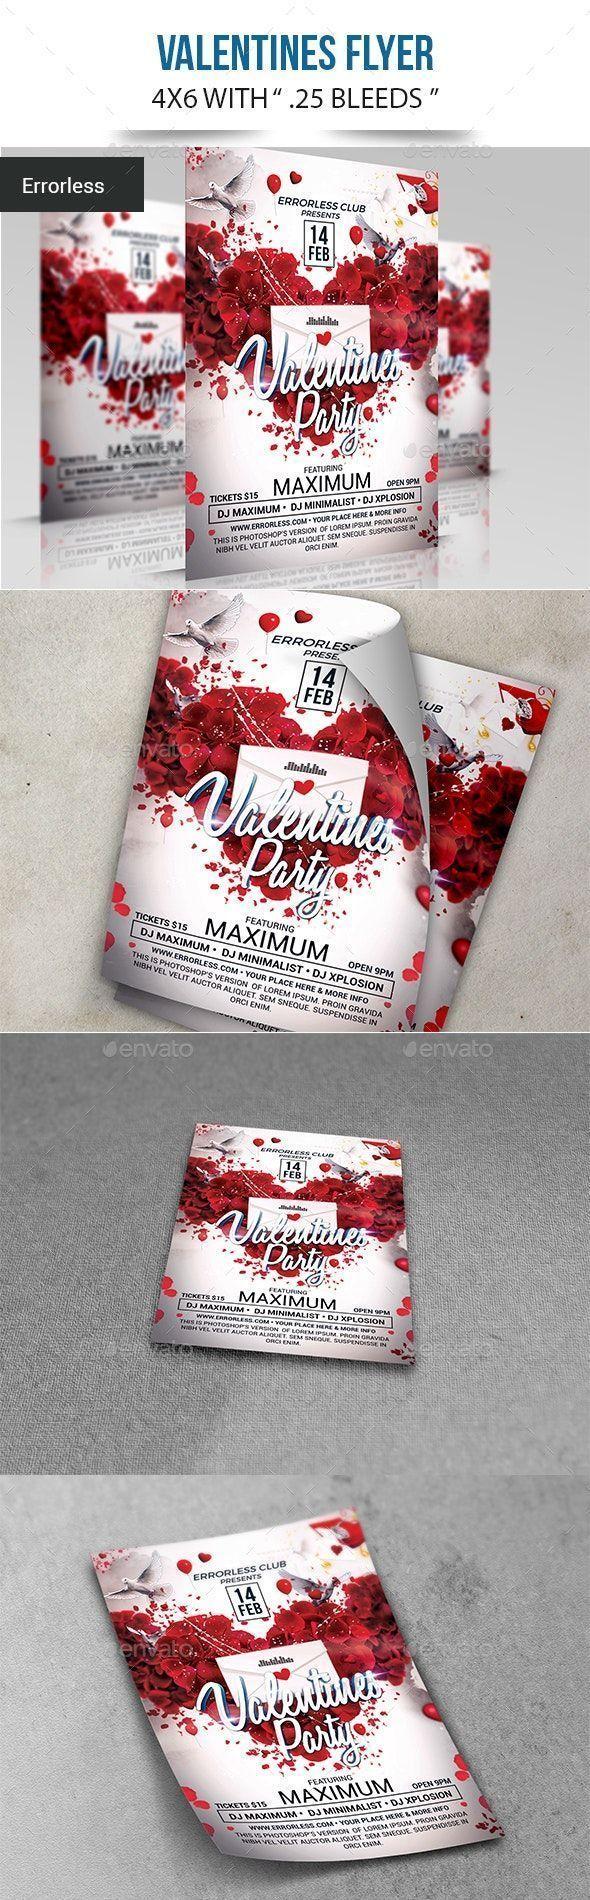 Valentine 's Day Flyer #valentines day party centerpieces Valentine' s Day Flyer - #Flye ... - #39s #centerpieces #Day #Flye #Flyer #Party #Valentine #Valentine39 #Valentines #valentinesdaydecorations